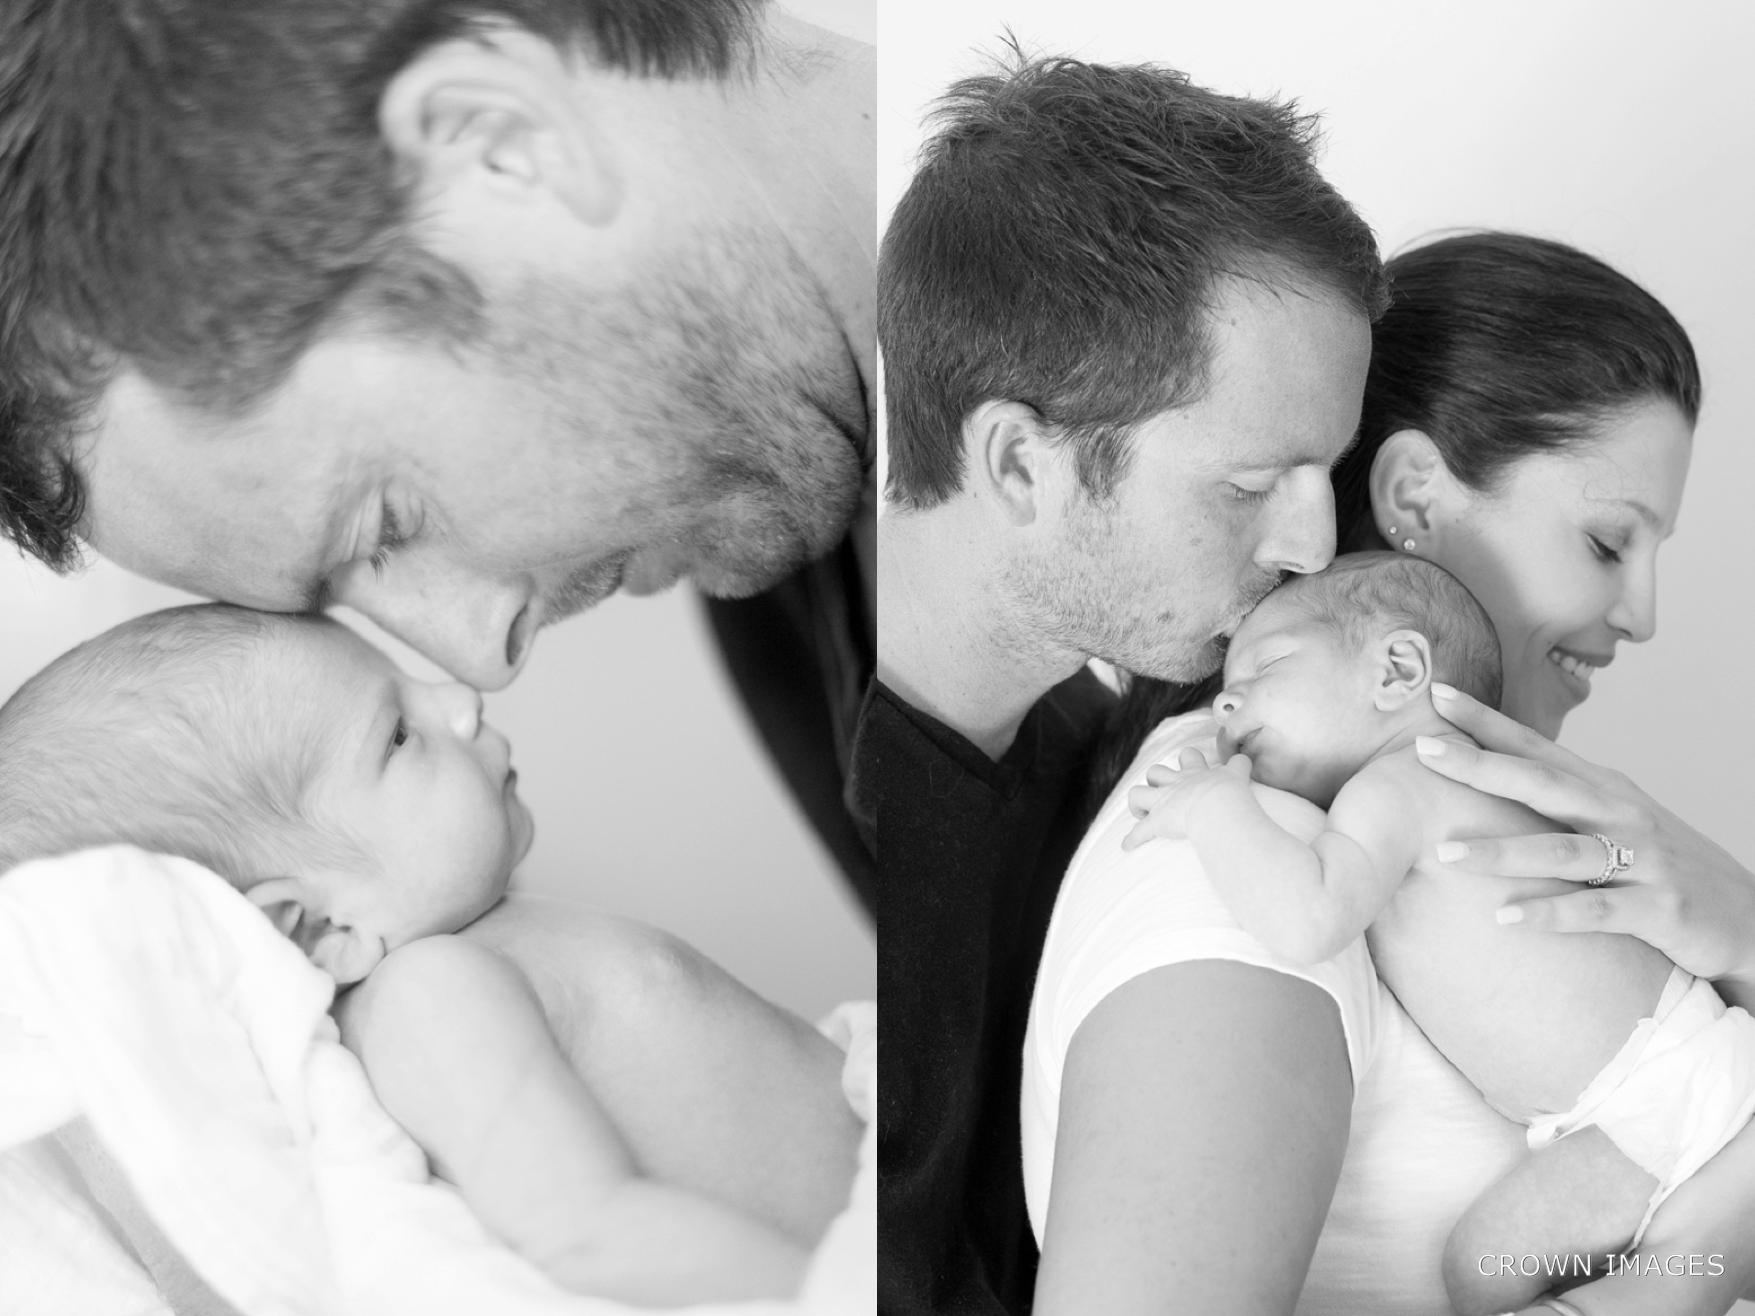 newborn_photos_usvi_crown_images_0551.jpg